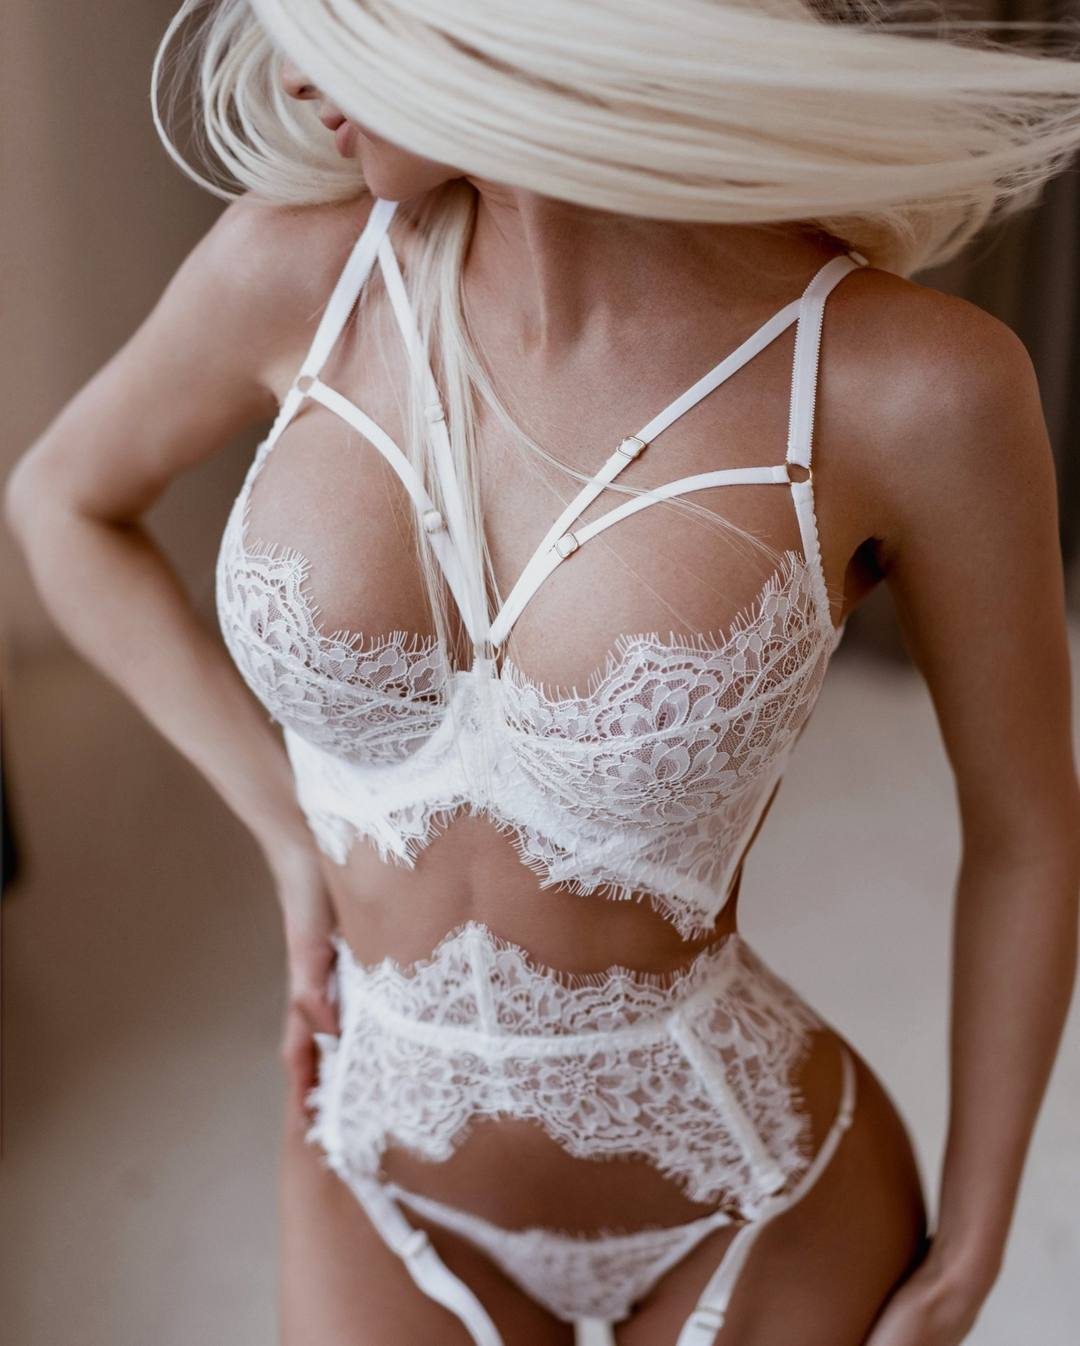 Marta Mayer Big Tits In Lingerie